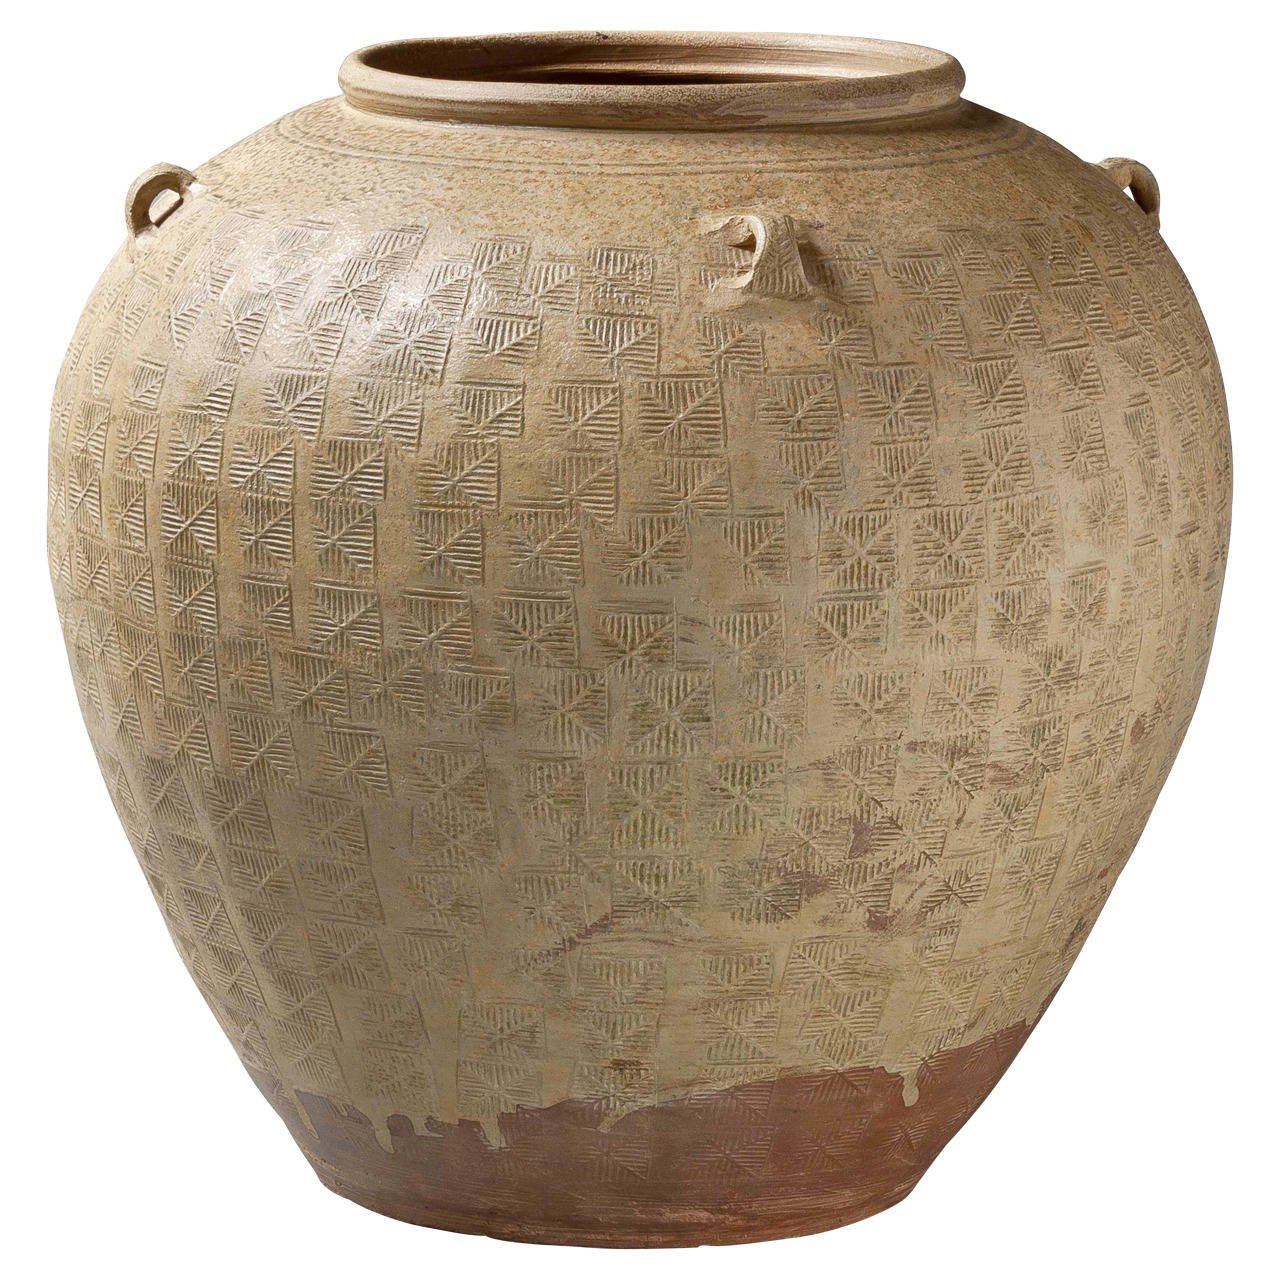 Eastern Han dynasty pottery jar, 2nd century AD